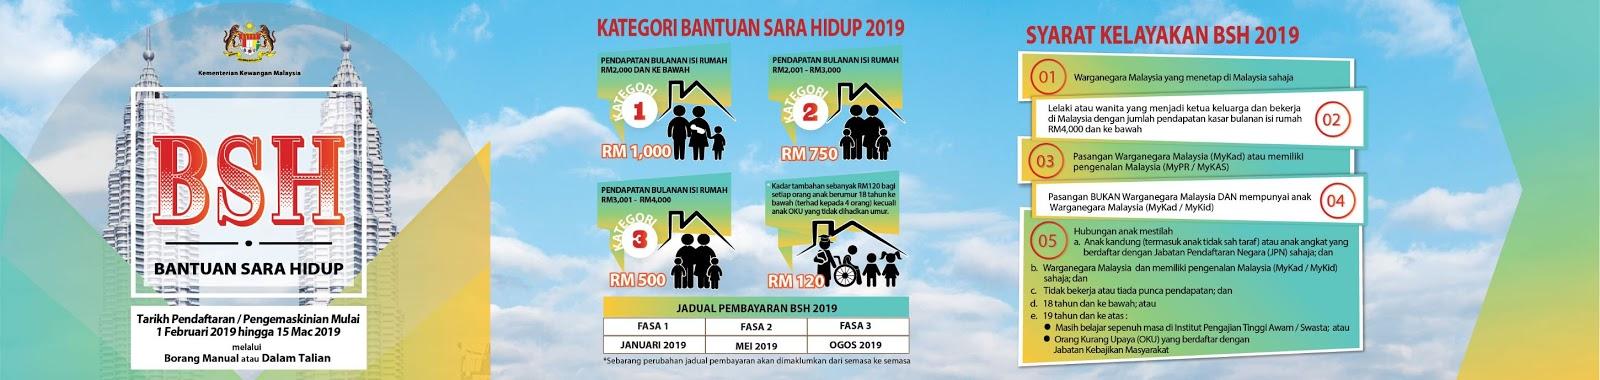 Fasa Pembayaran Bantuan Sara Hidup 2020 : 20 Januari 2020